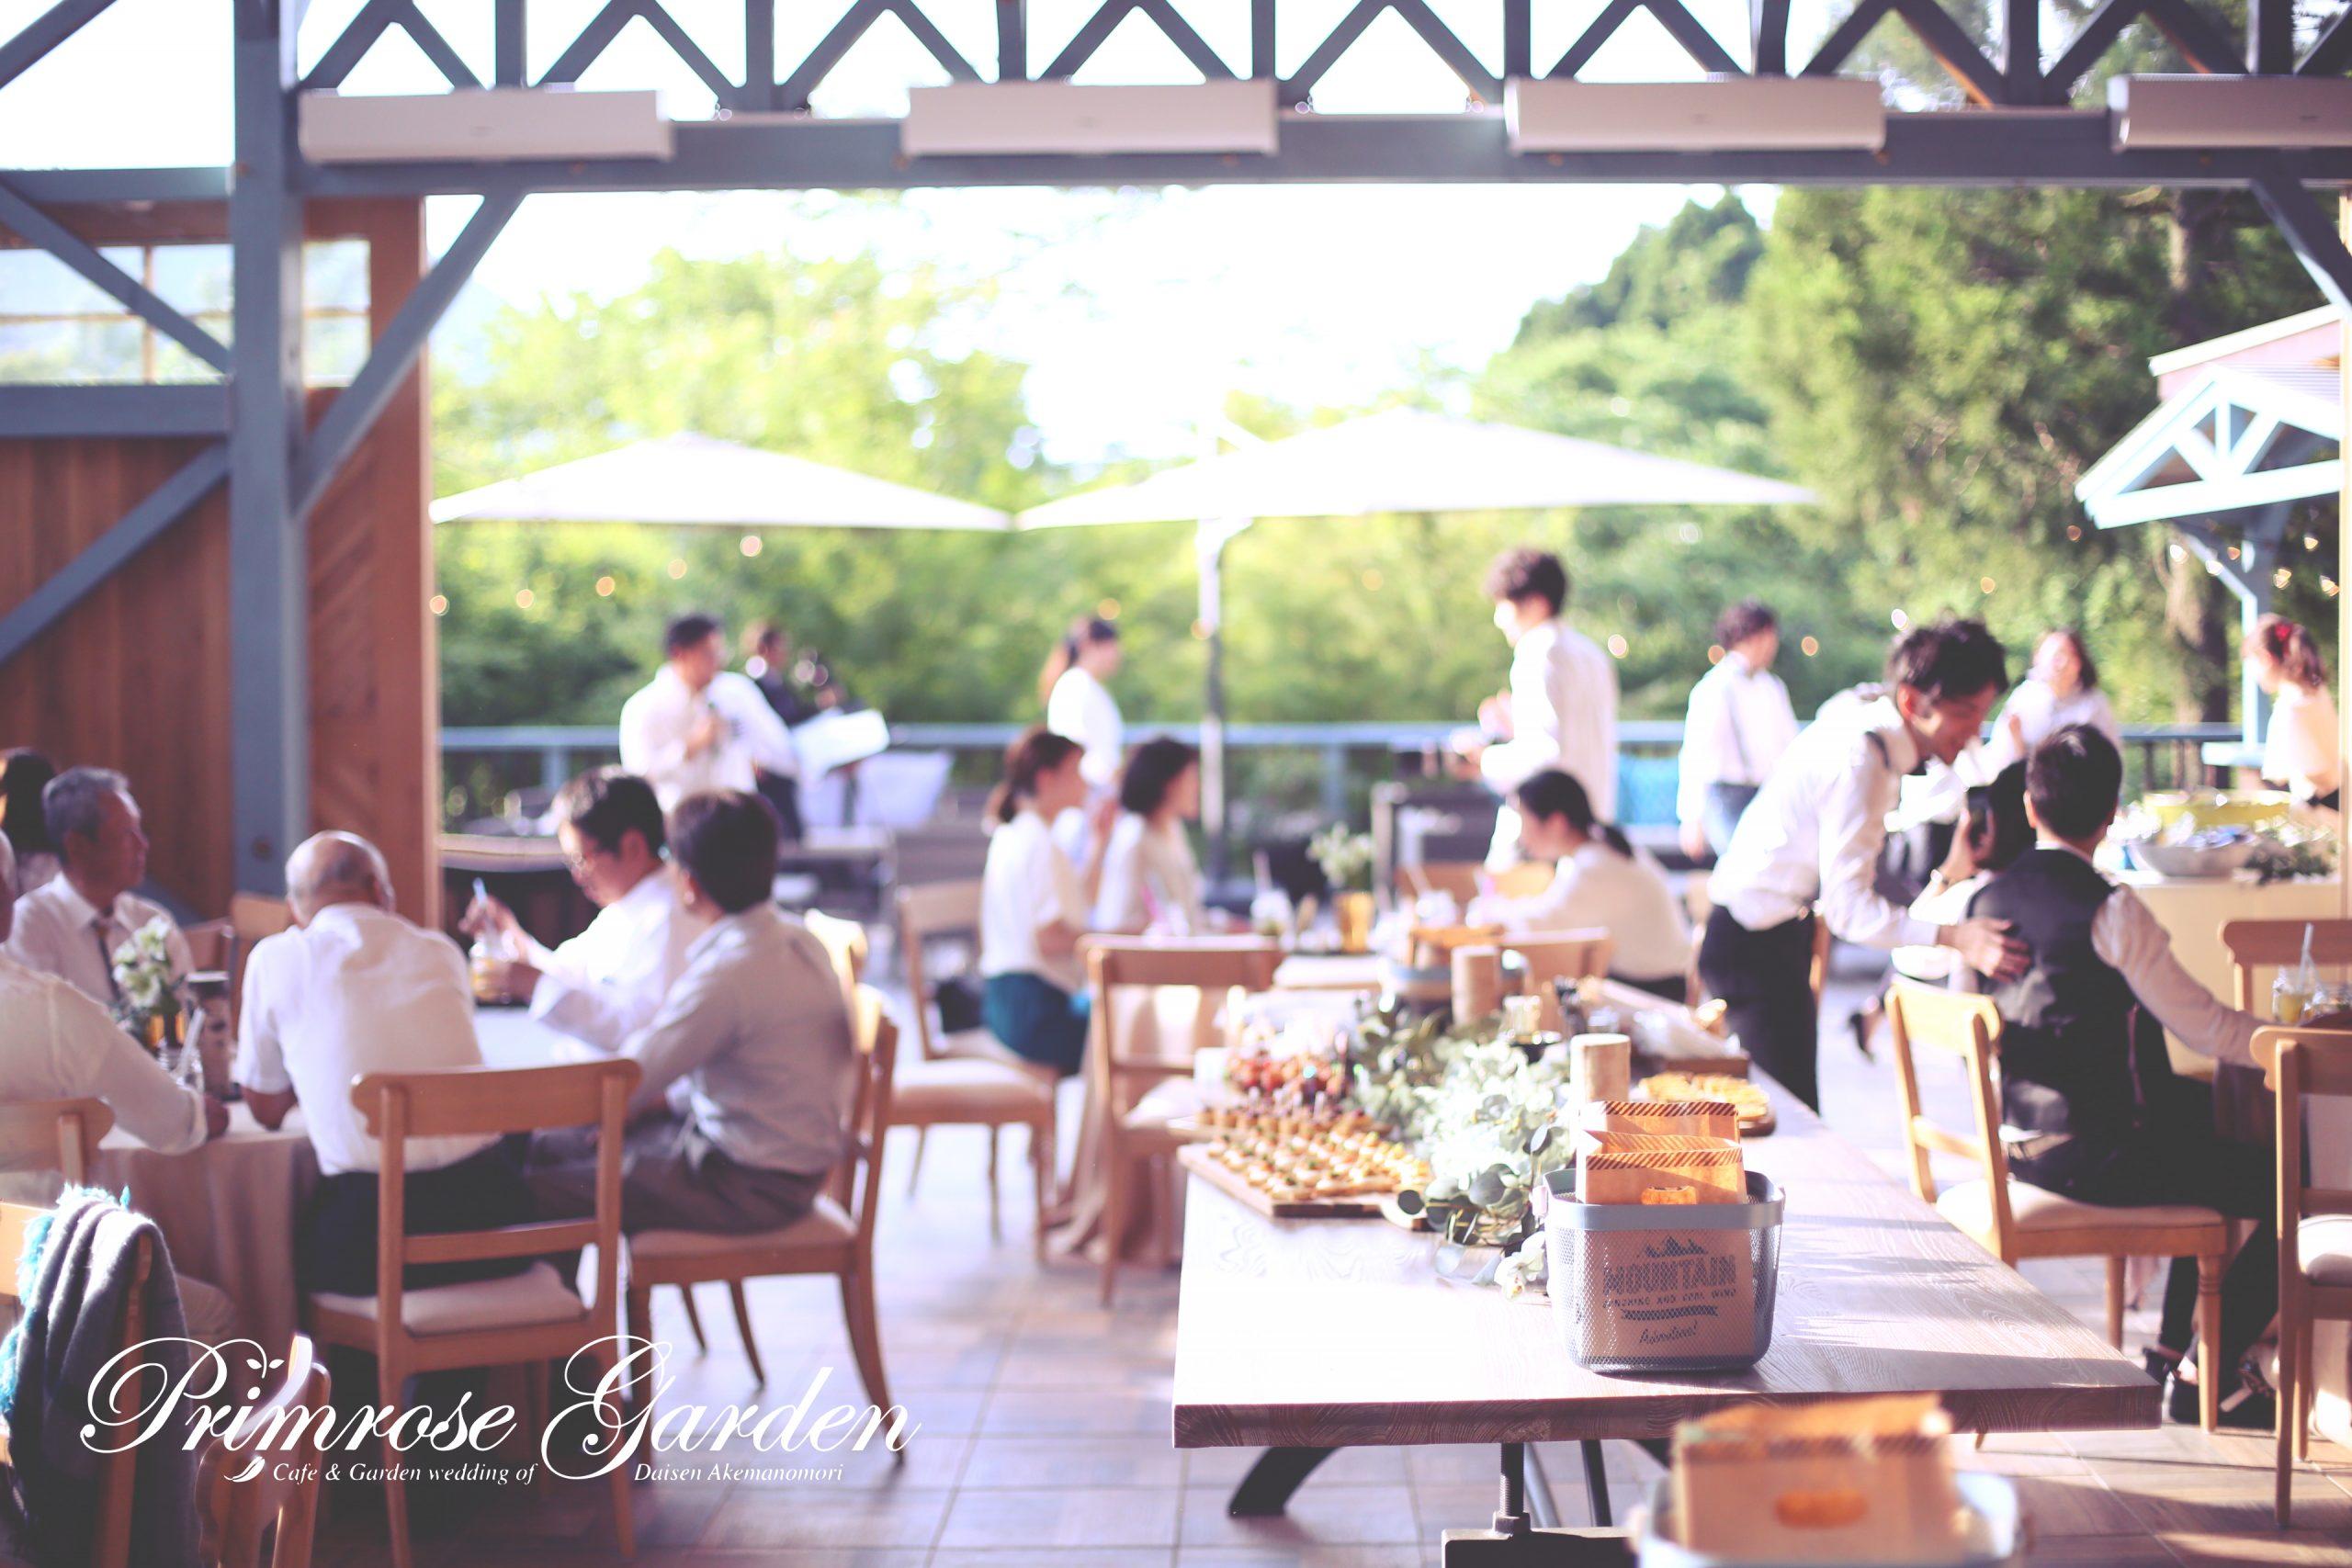 Glamping Terrace 歐陸風格空間與自然融合,賓客可享受戶外的開放感。